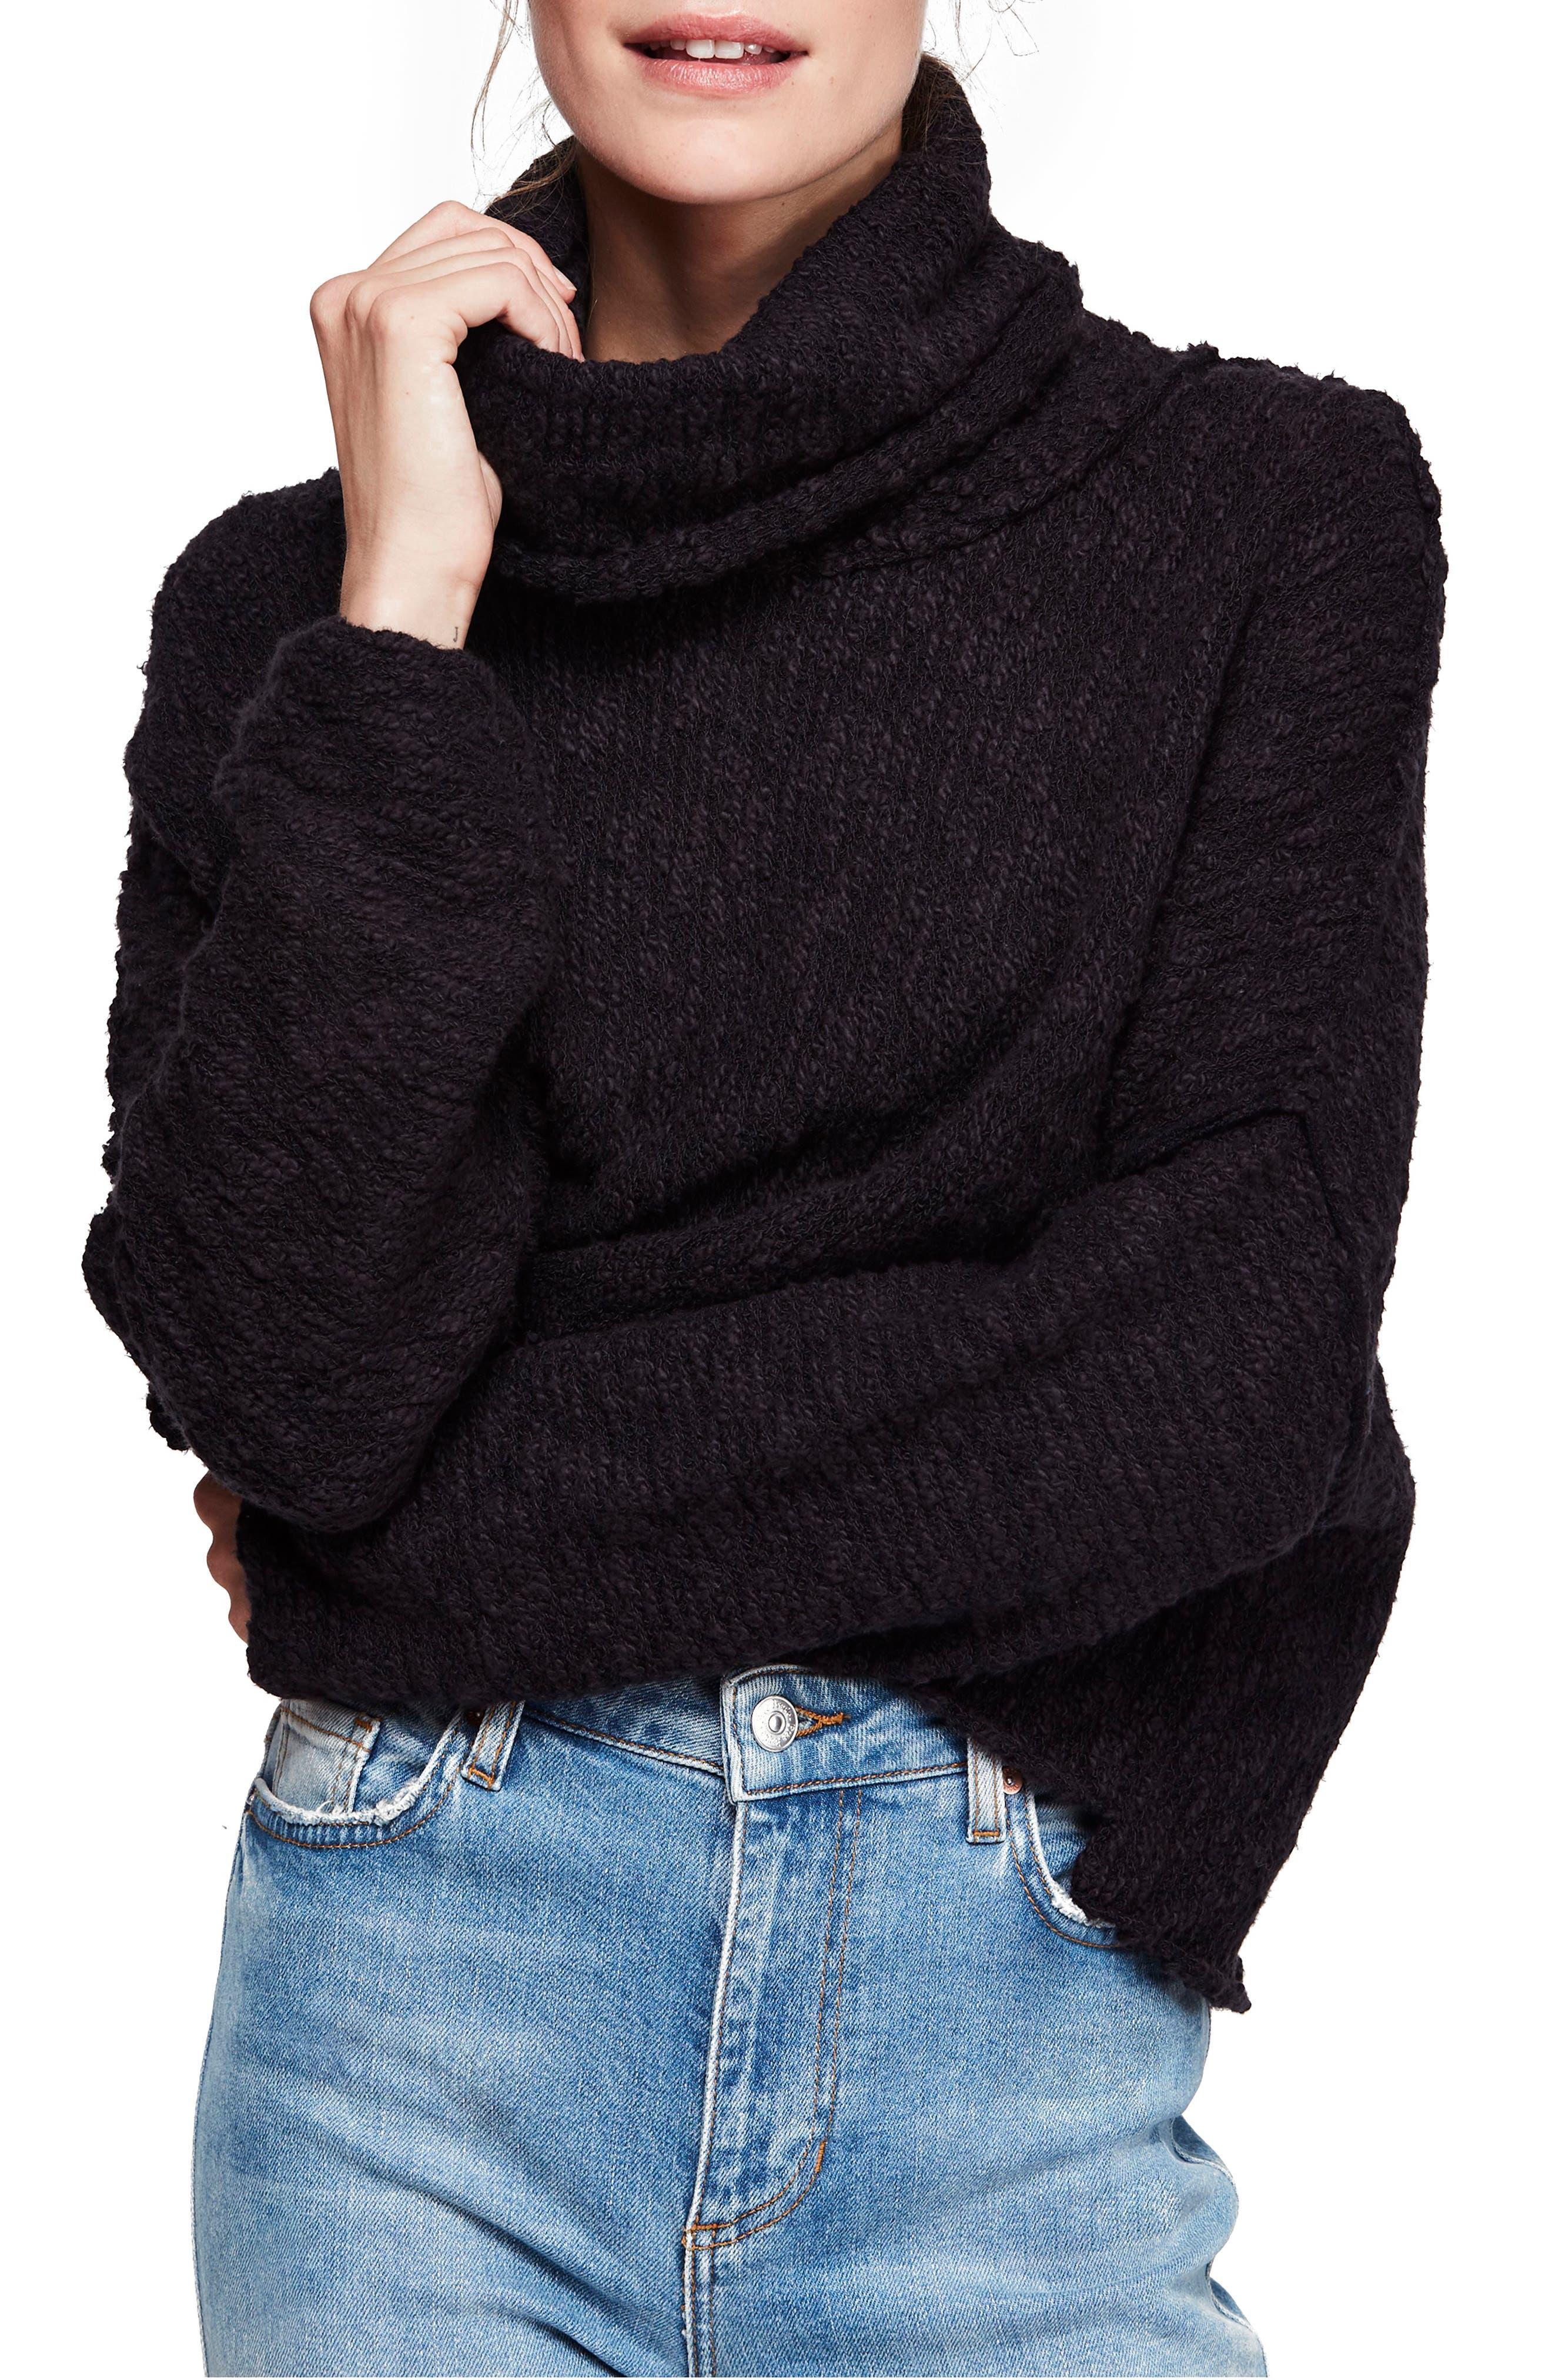 Big Easy Cowl Neck Crop Sweater,                             Main thumbnail 1, color,                             BLACK